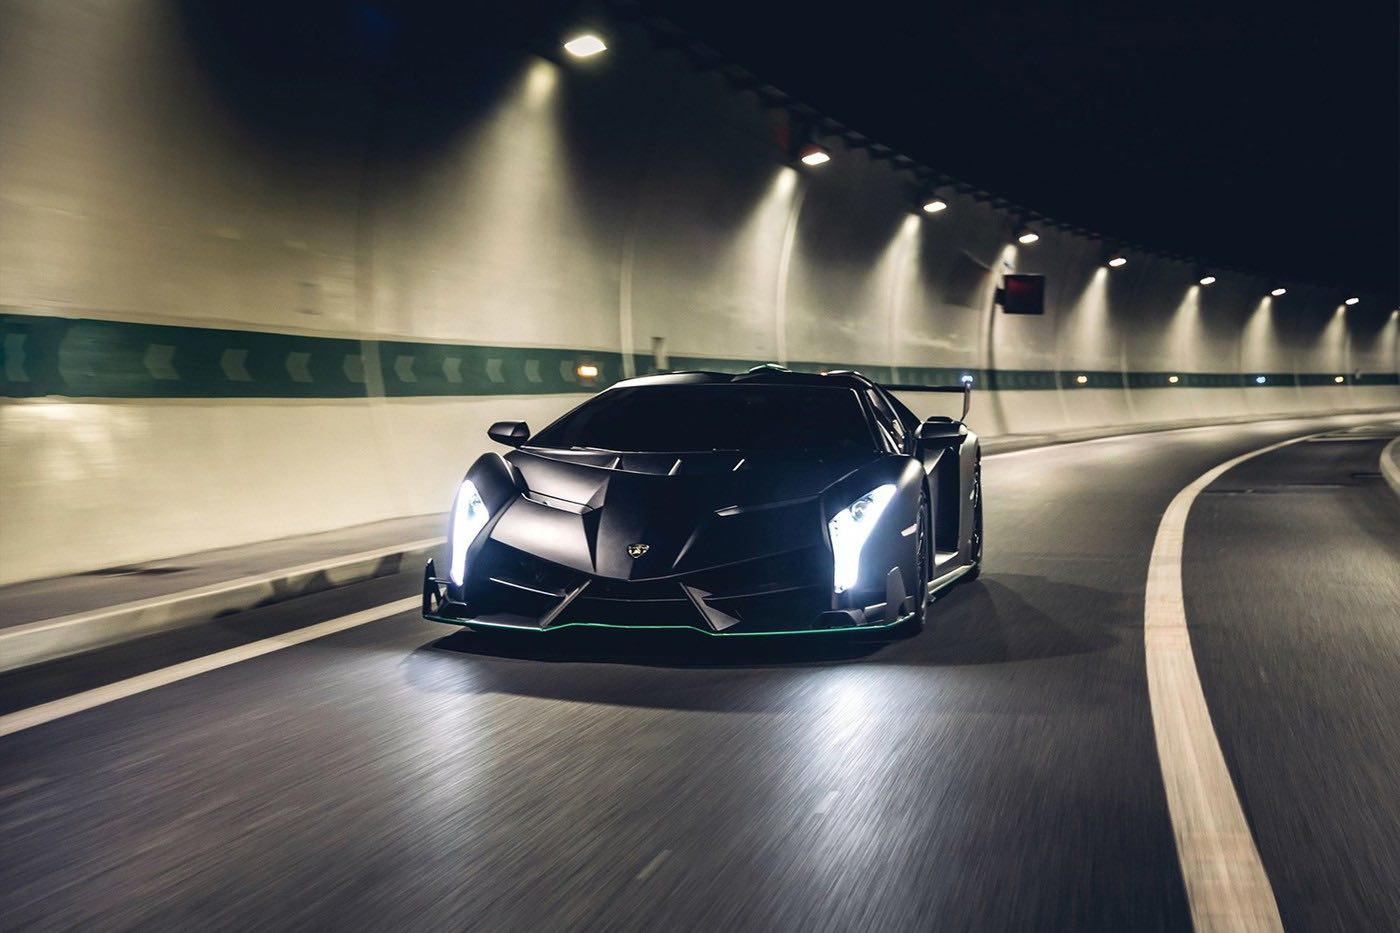 Este Lamborghini Veneno Roadster 2015 se subastará el próximo 5 de febrero en Paris